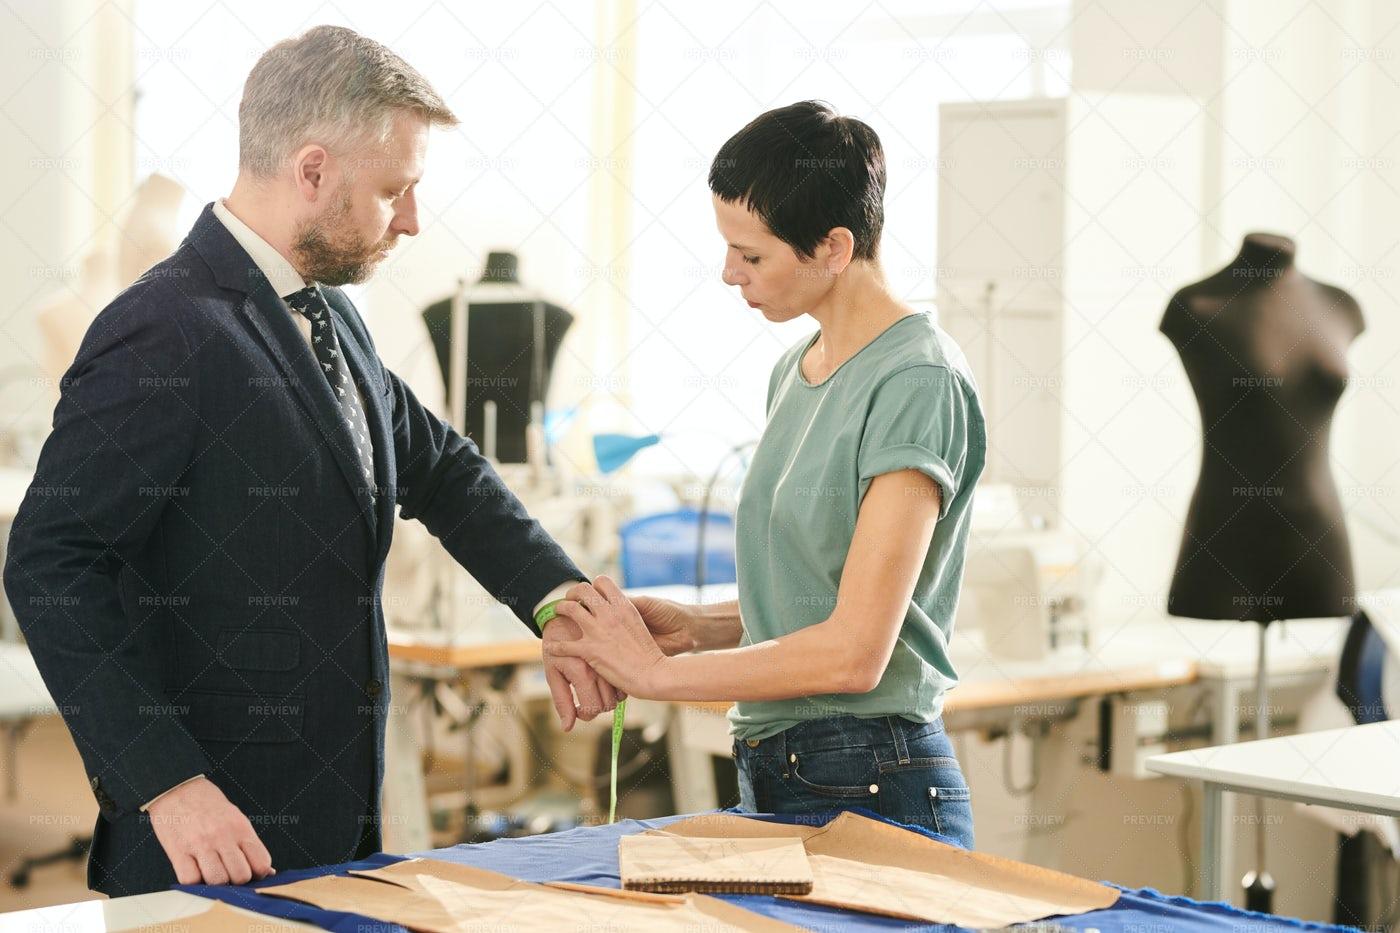 Measuring Wrist Of Client: Stock Photos